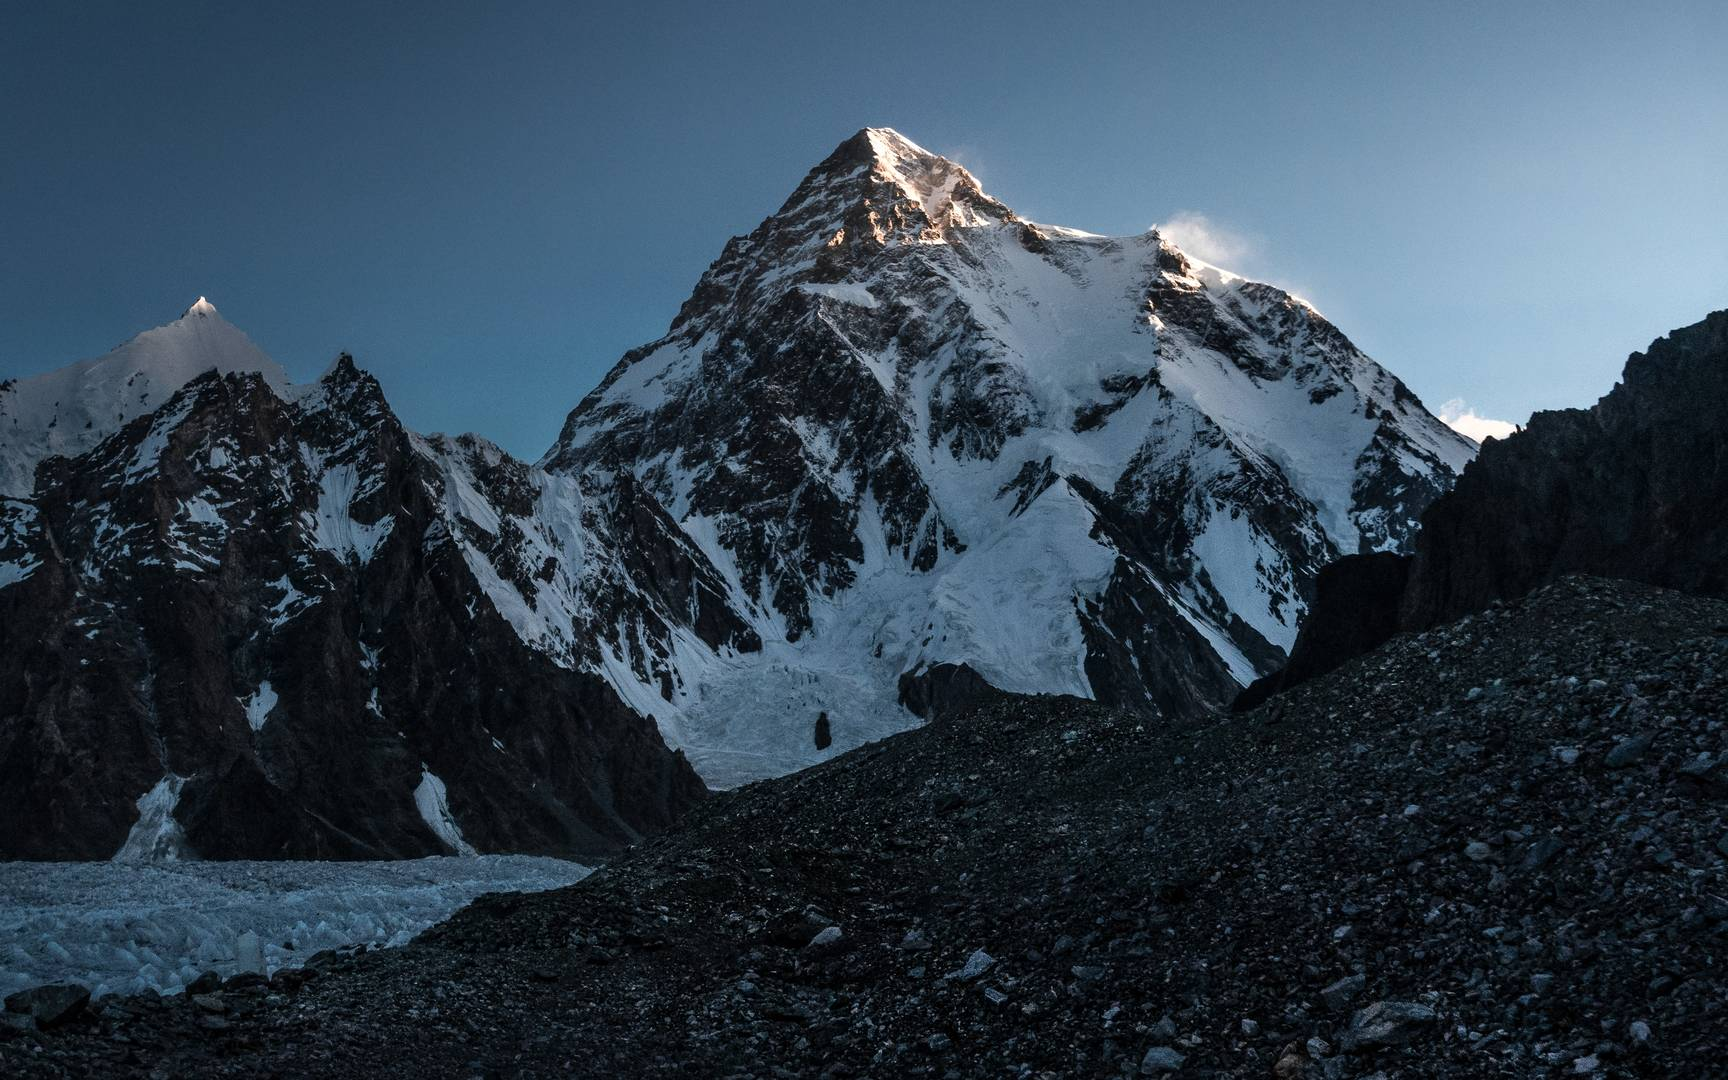 Chogori, Großer Berg, Keh Tuh oder einfach K2